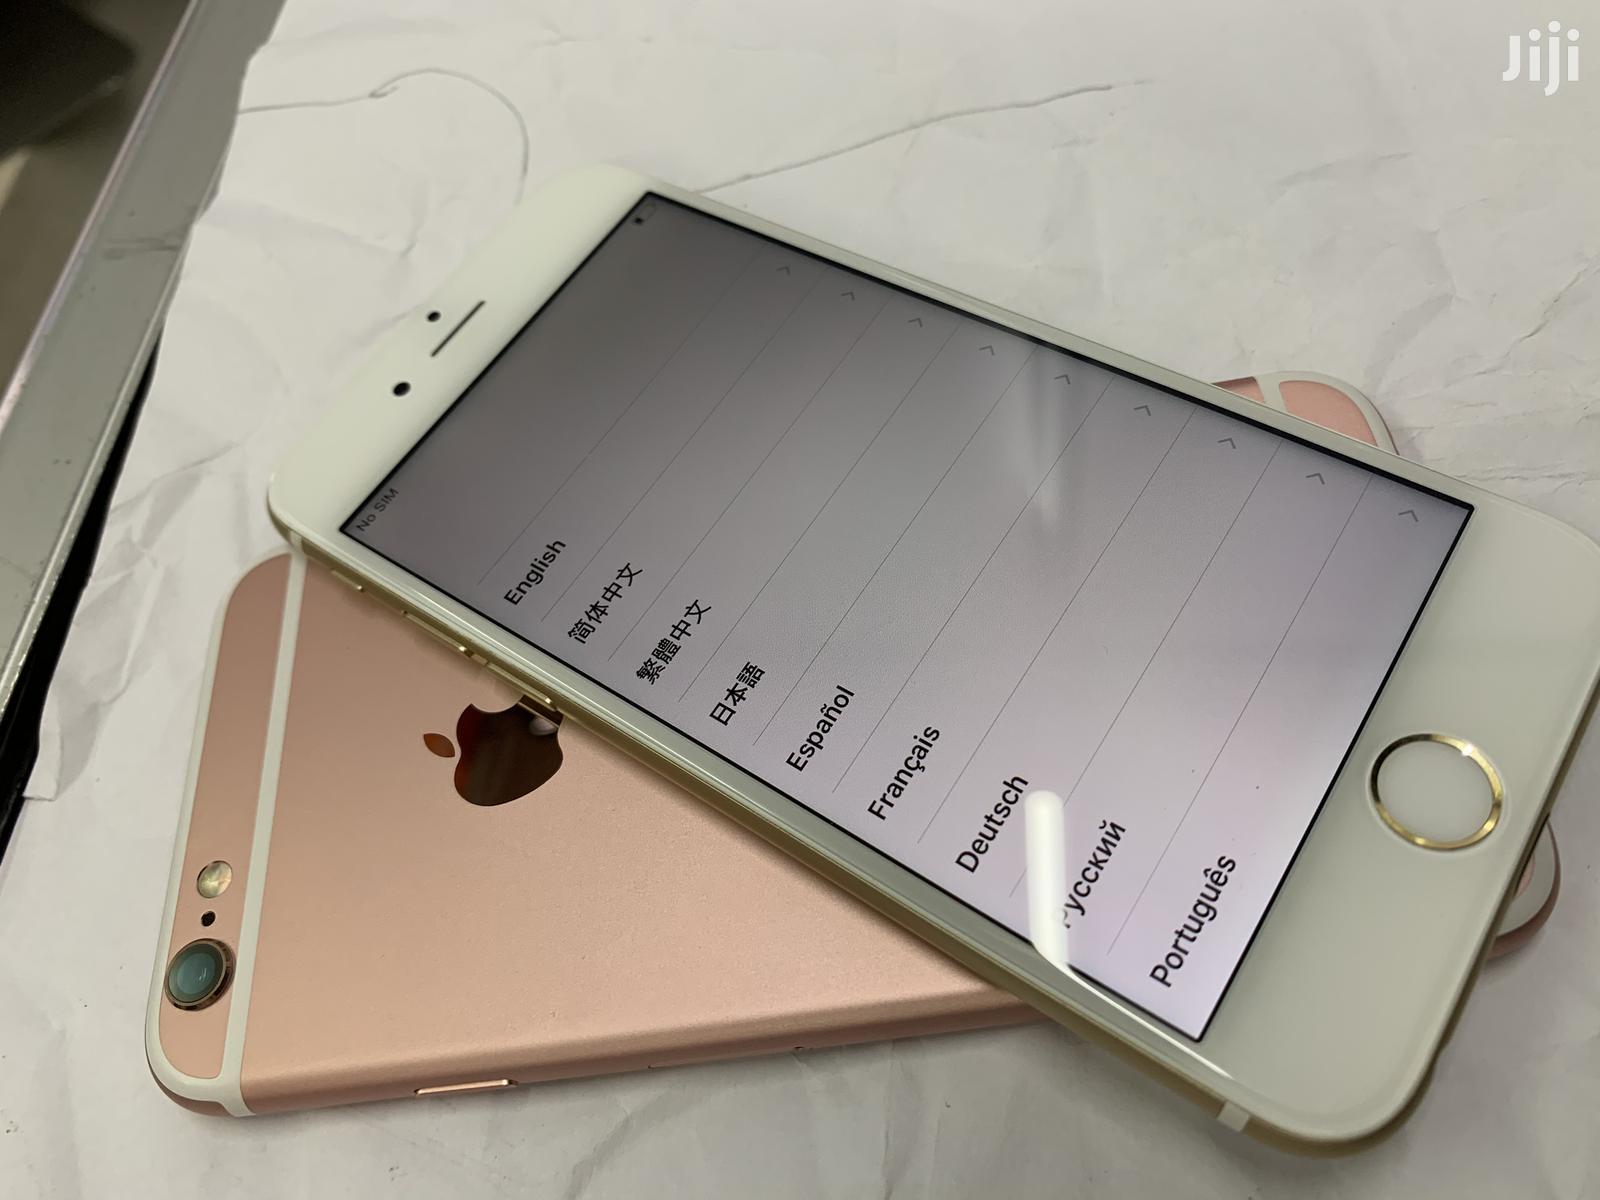 Apple iPhone 6s 64 GB Gold | Mobile Phones for sale in Nairobi Central, Nairobi, Kenya